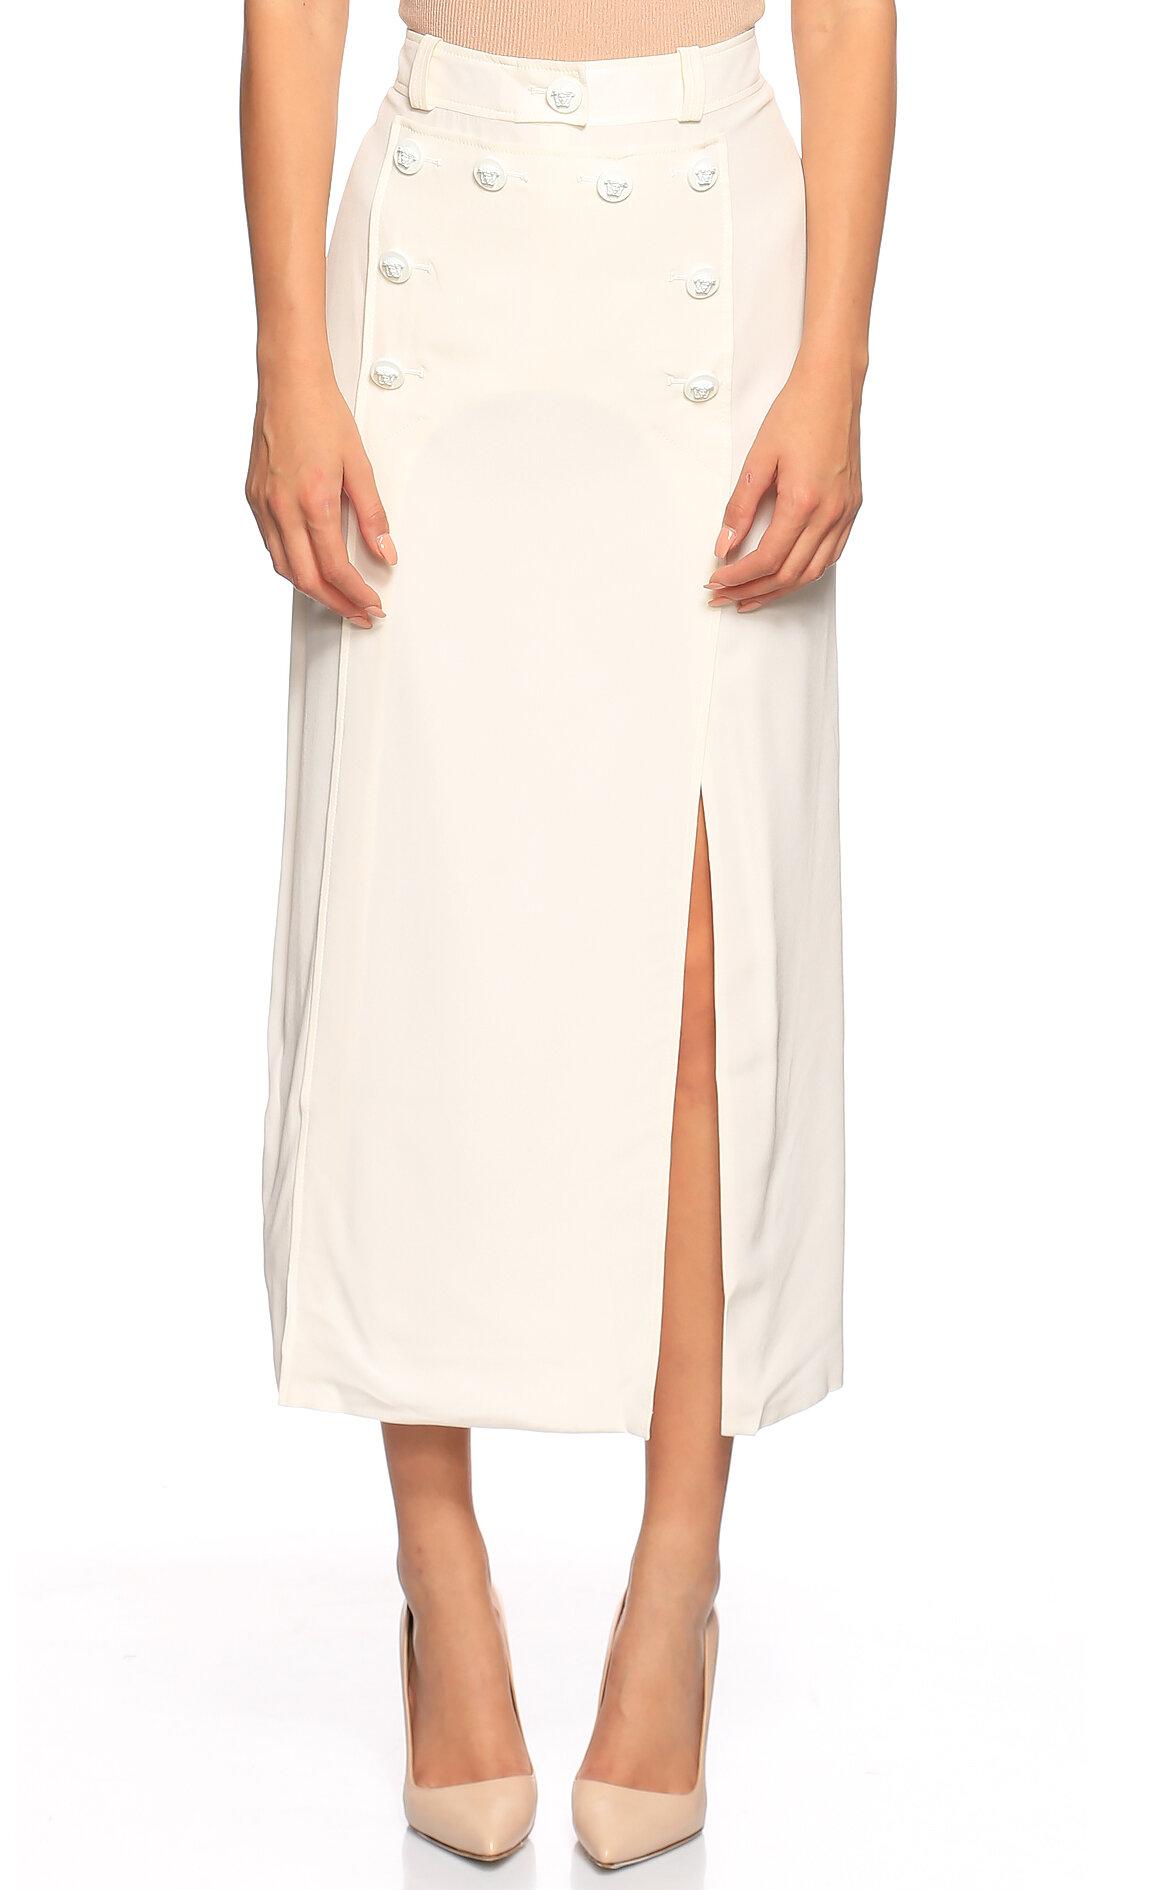 Versace-Versace Midi Beyaz Etek